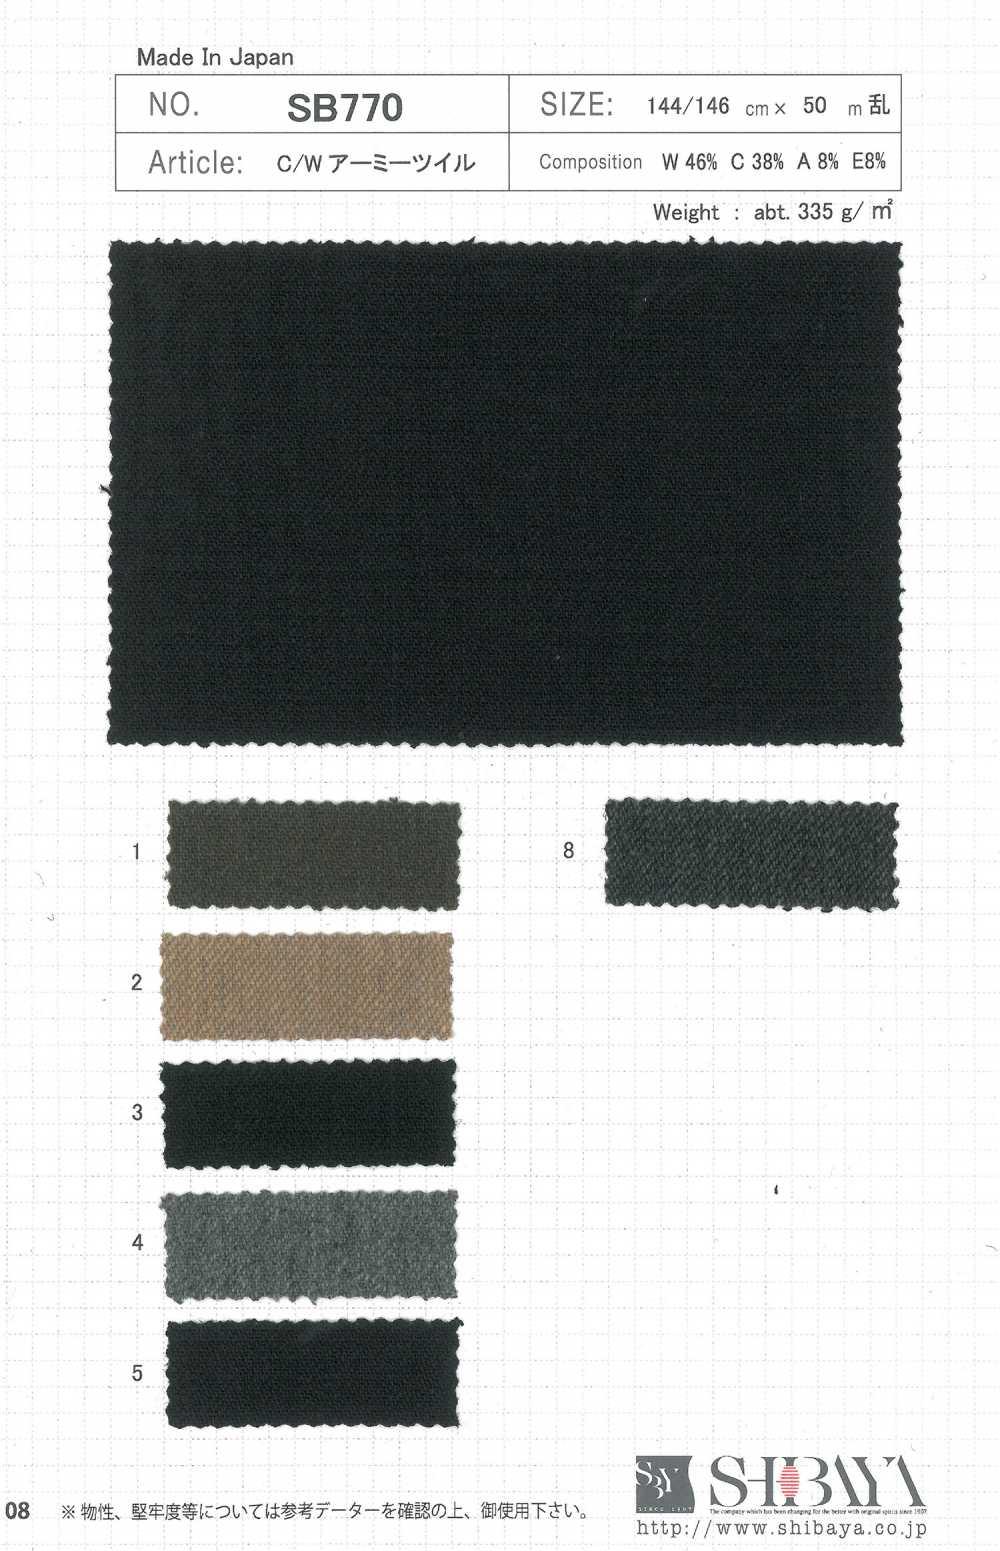 SB770 C/W アーミーツイル[生地] 柴屋/オークラ商事 - ApparelX アパレル資材卸通販